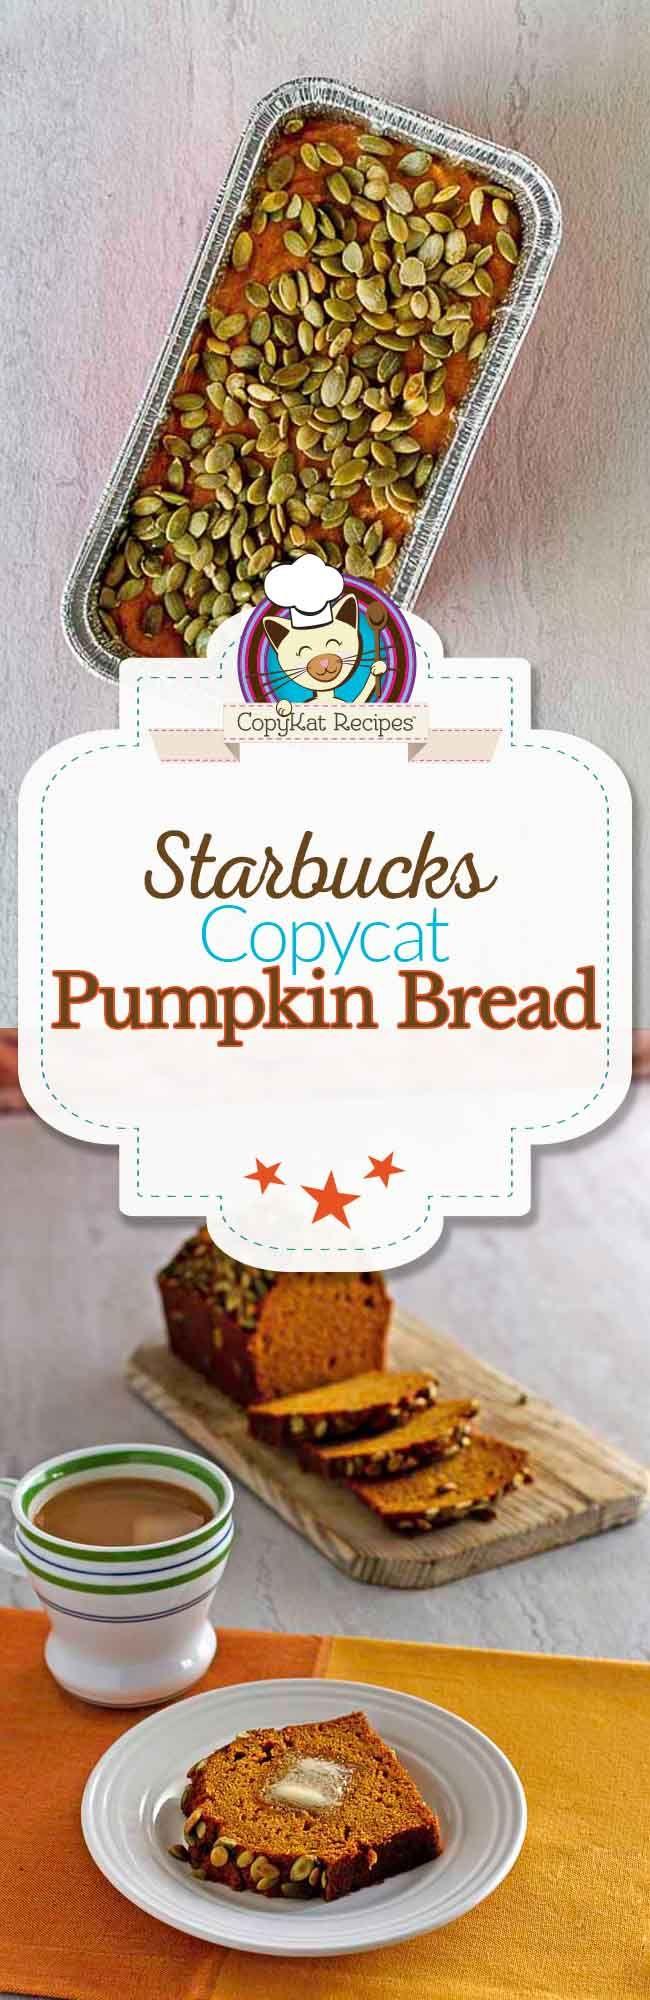 Starbucks Pumpkin Bread Recipe Starbucks pumpkin bread